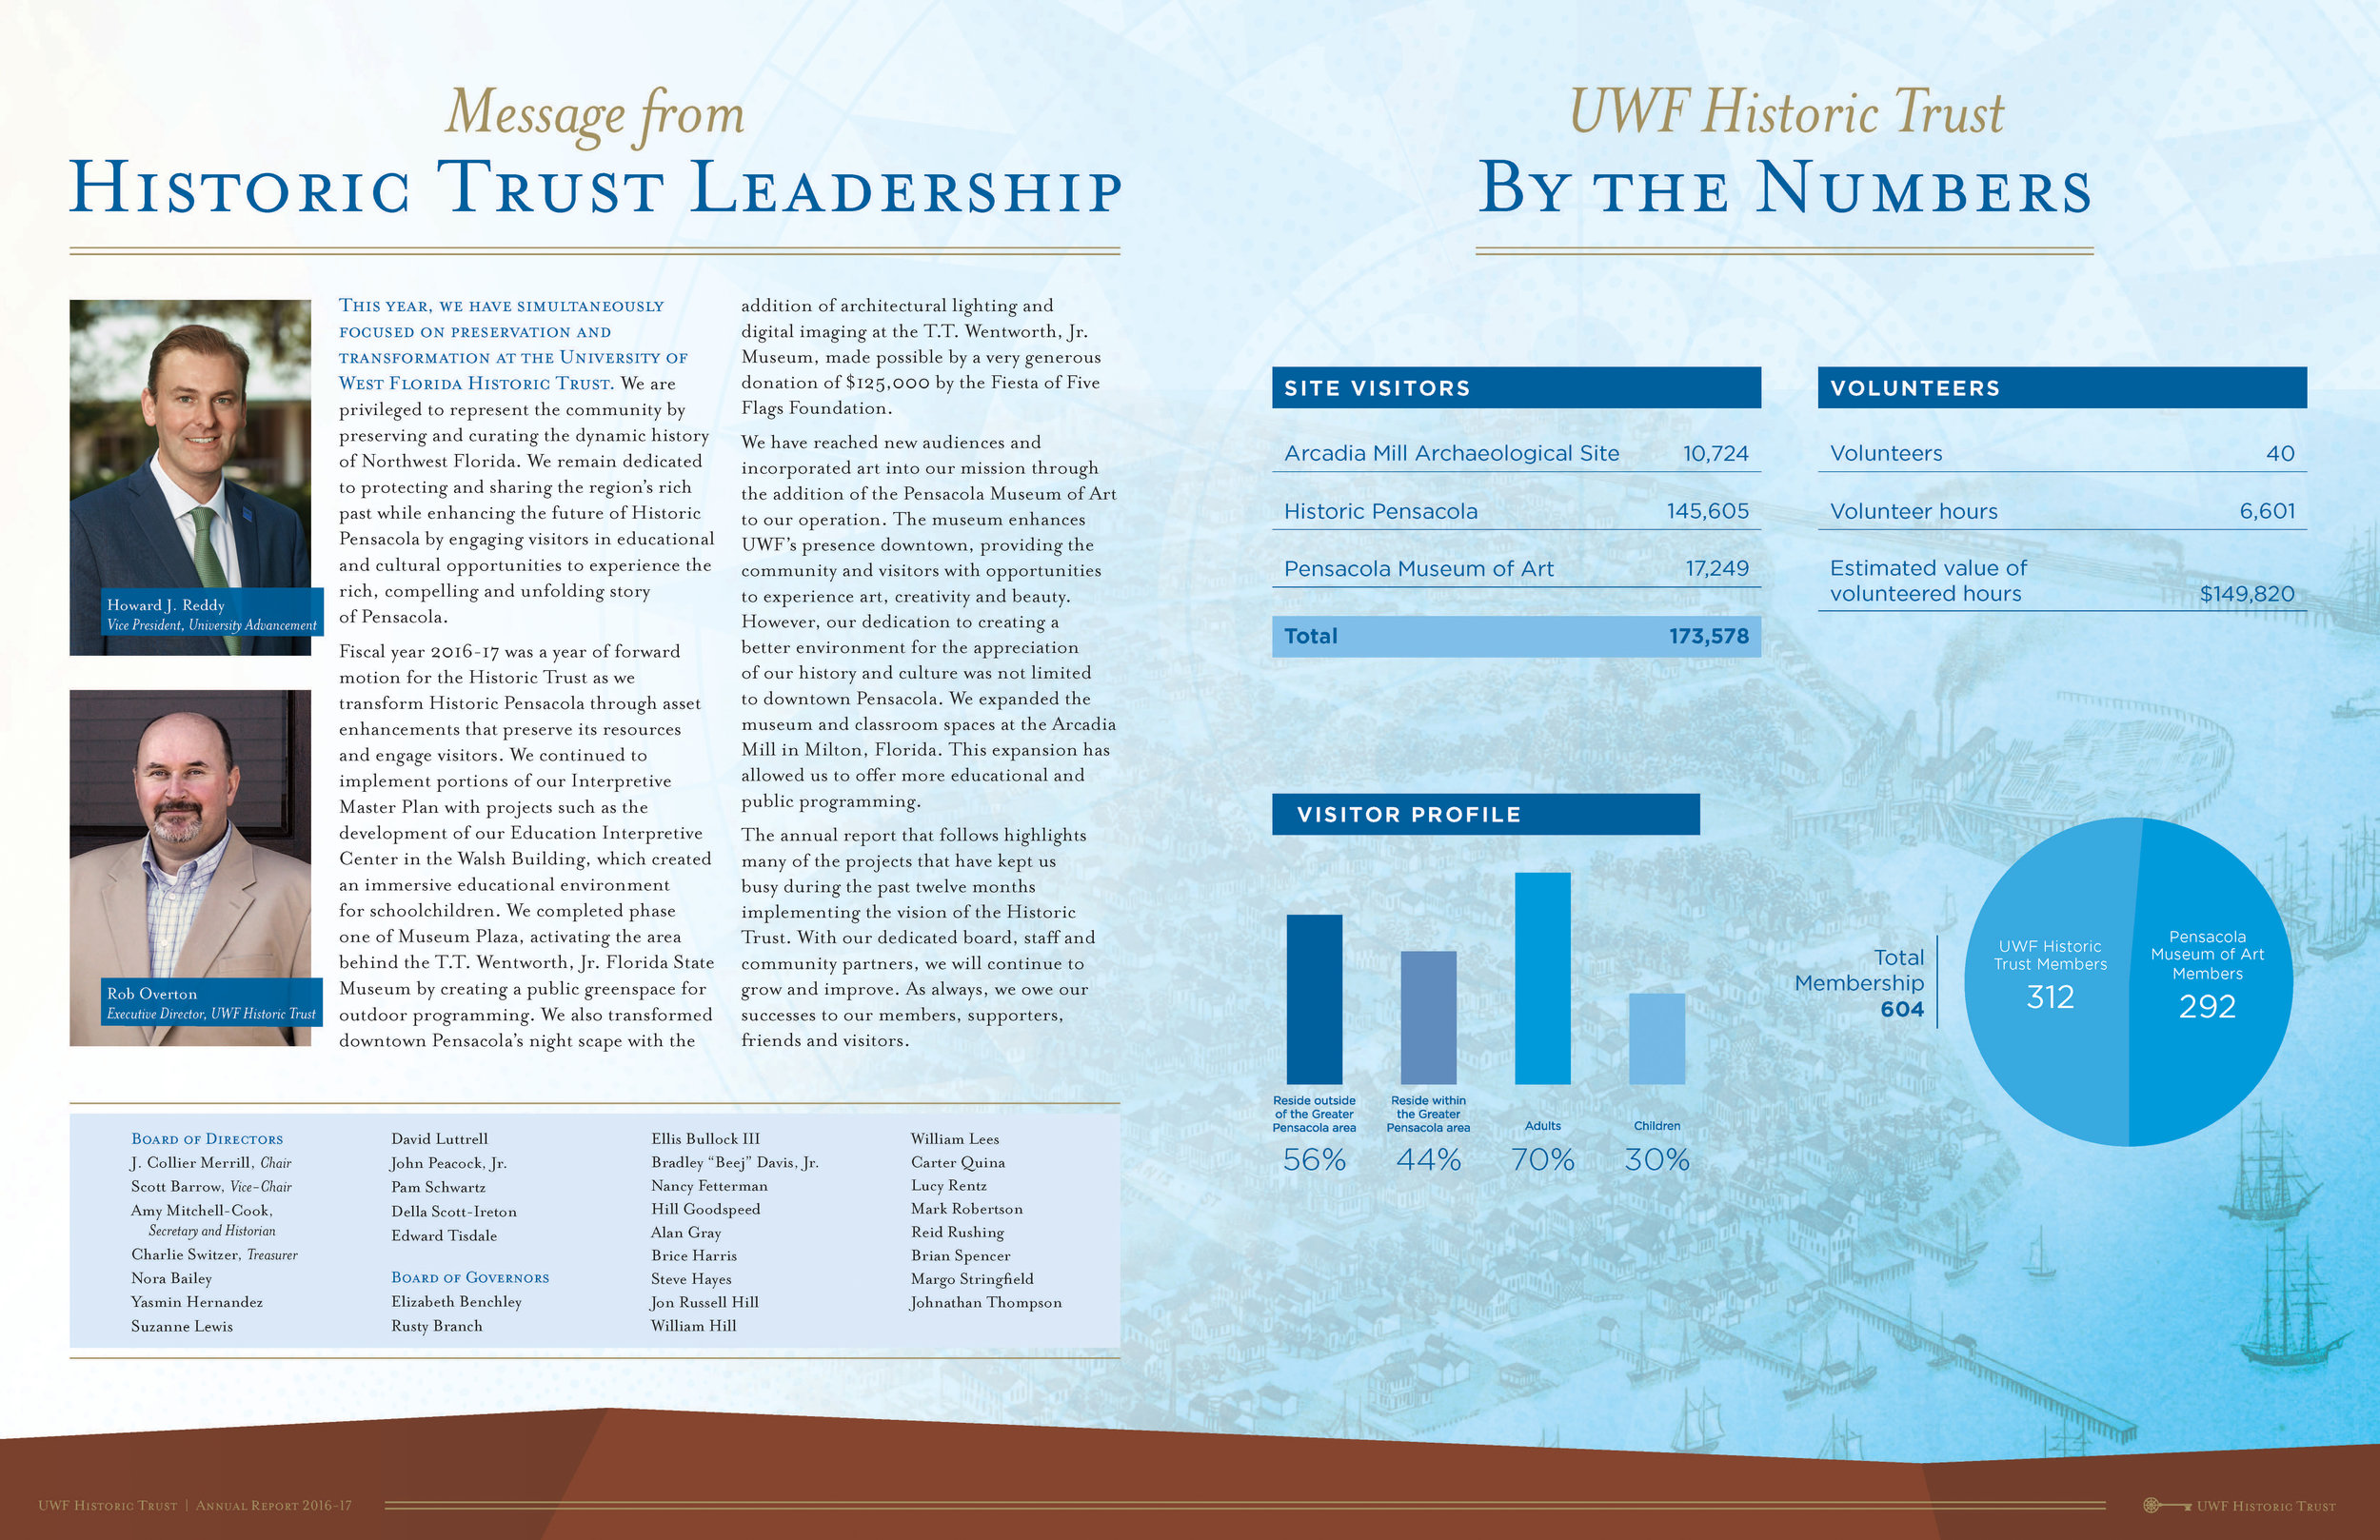 HistoricTrust_AnnualReport_2017_11_Page_2.jpg